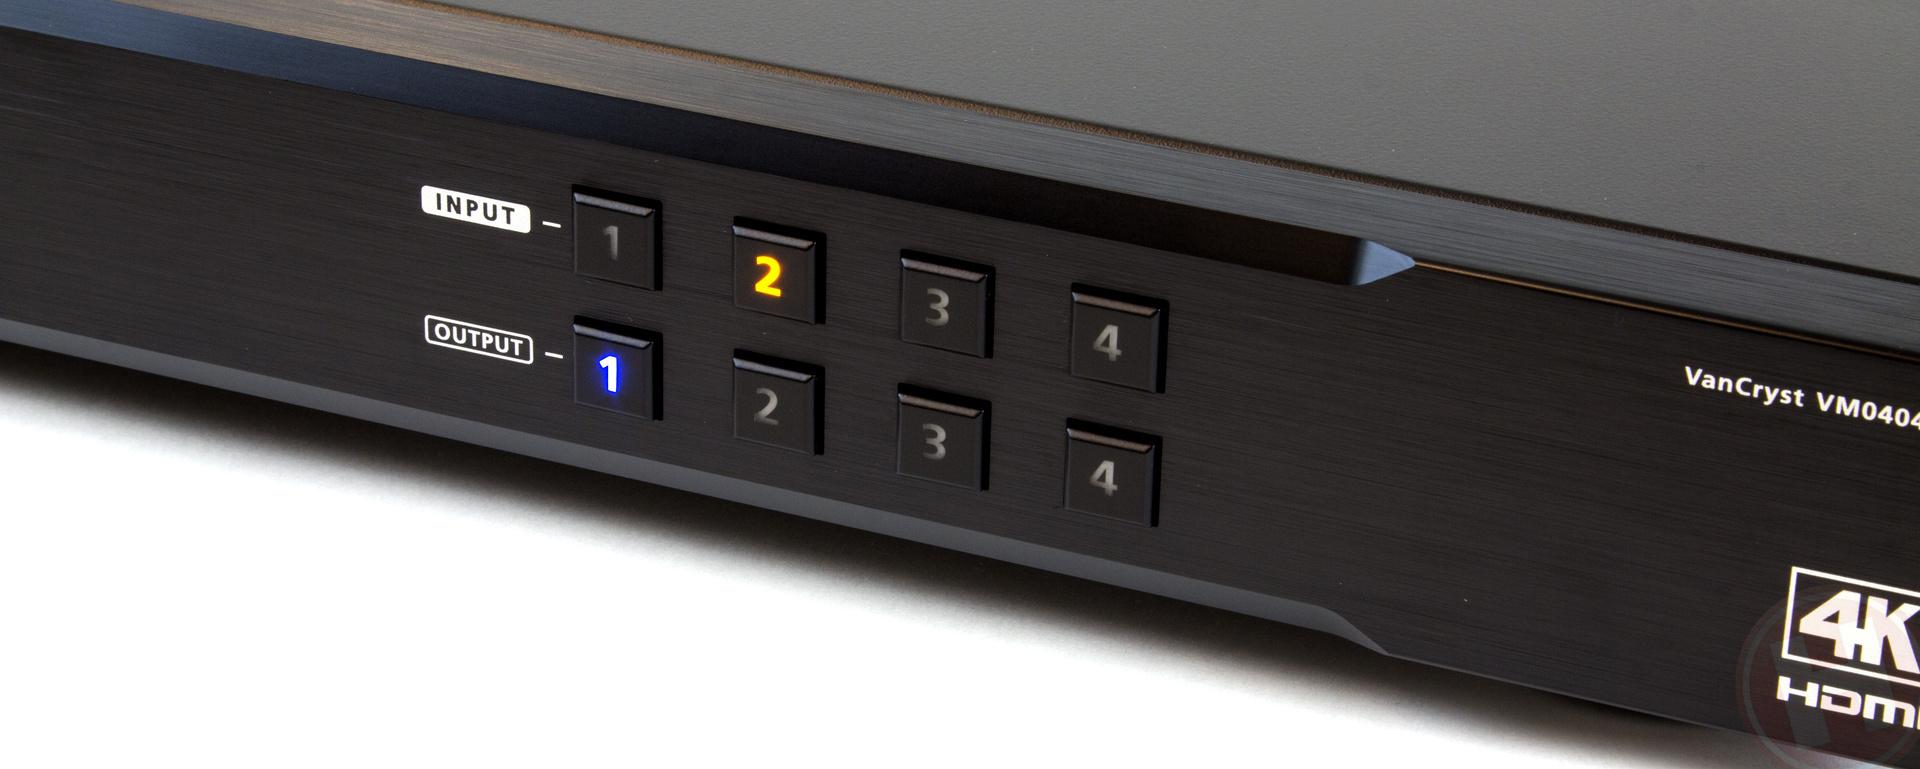 HDMI Matrix Switchers   Extron